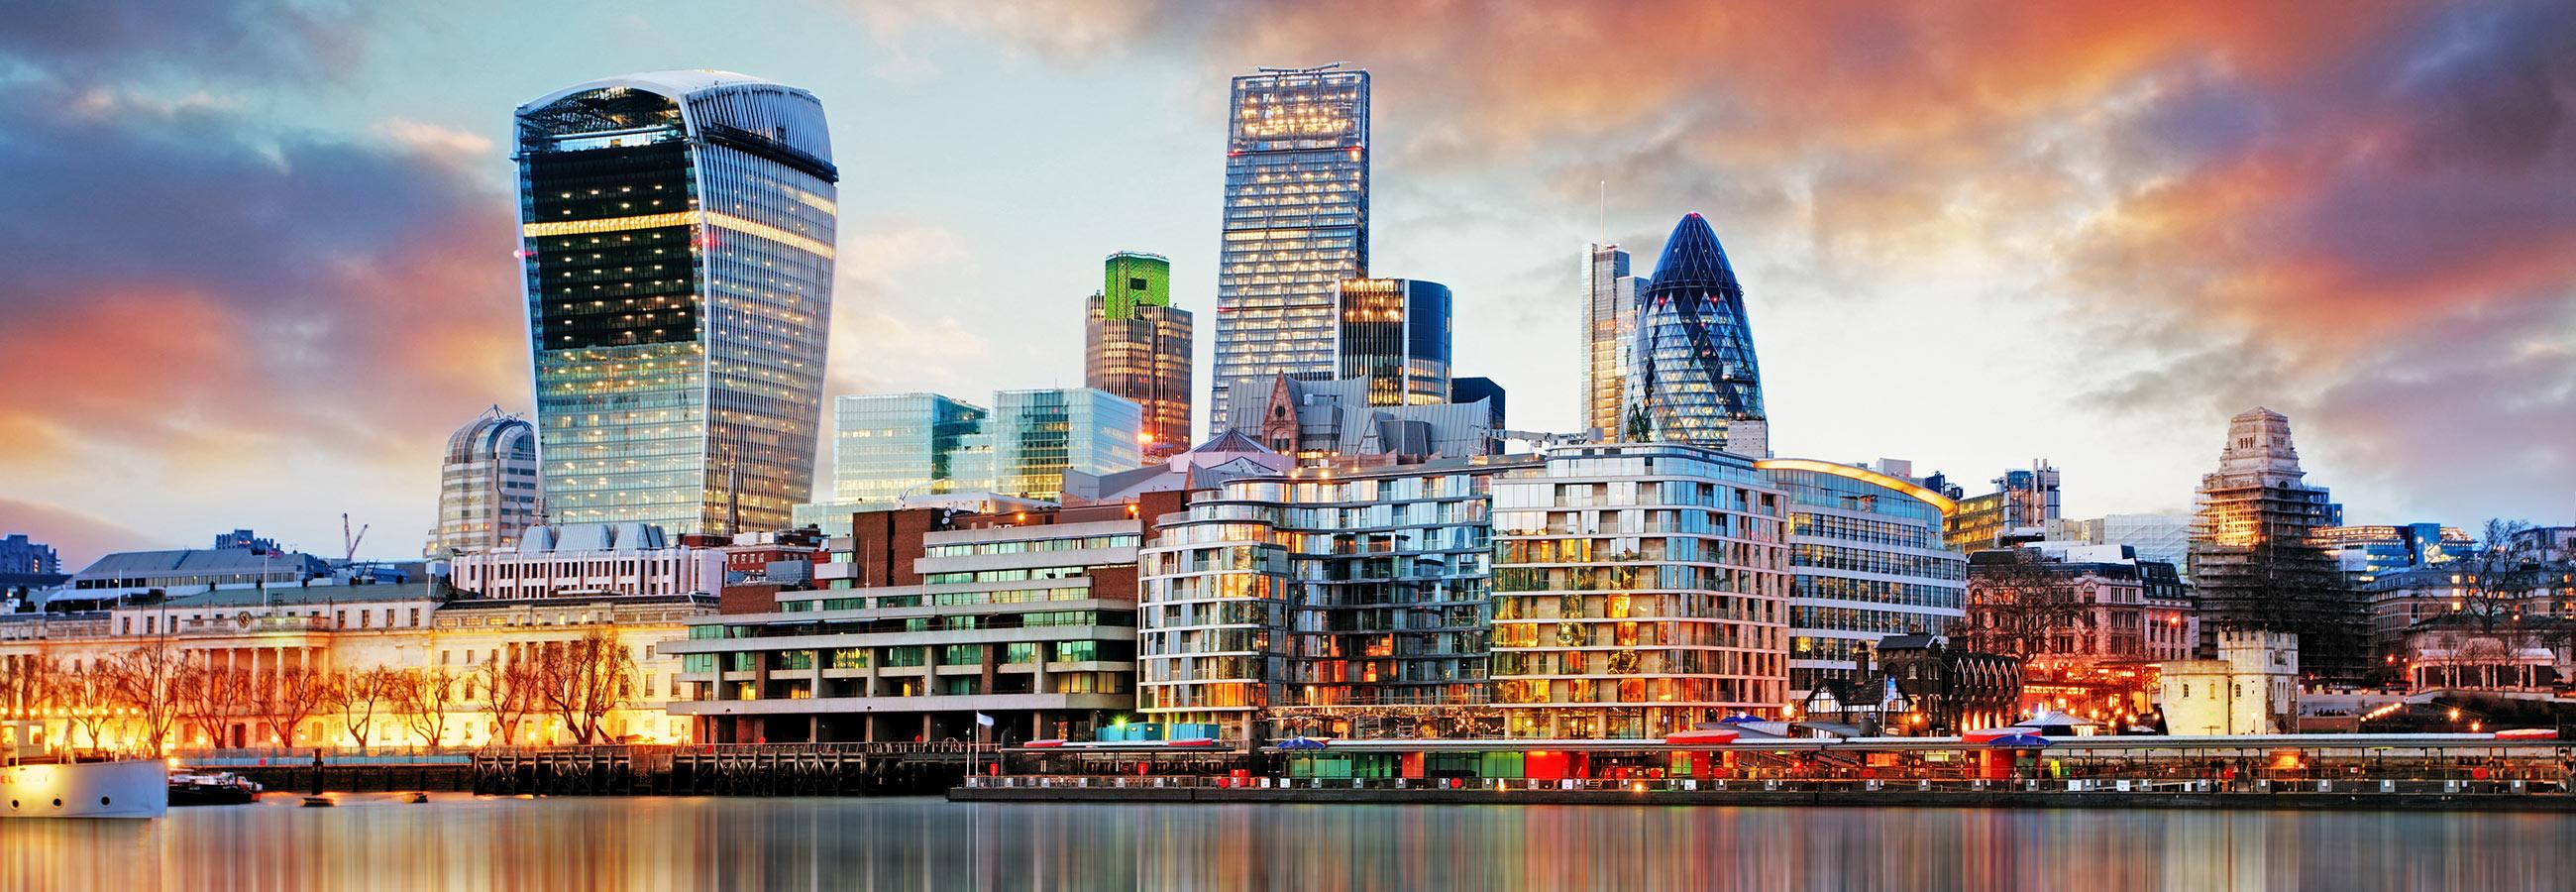 london_landscape